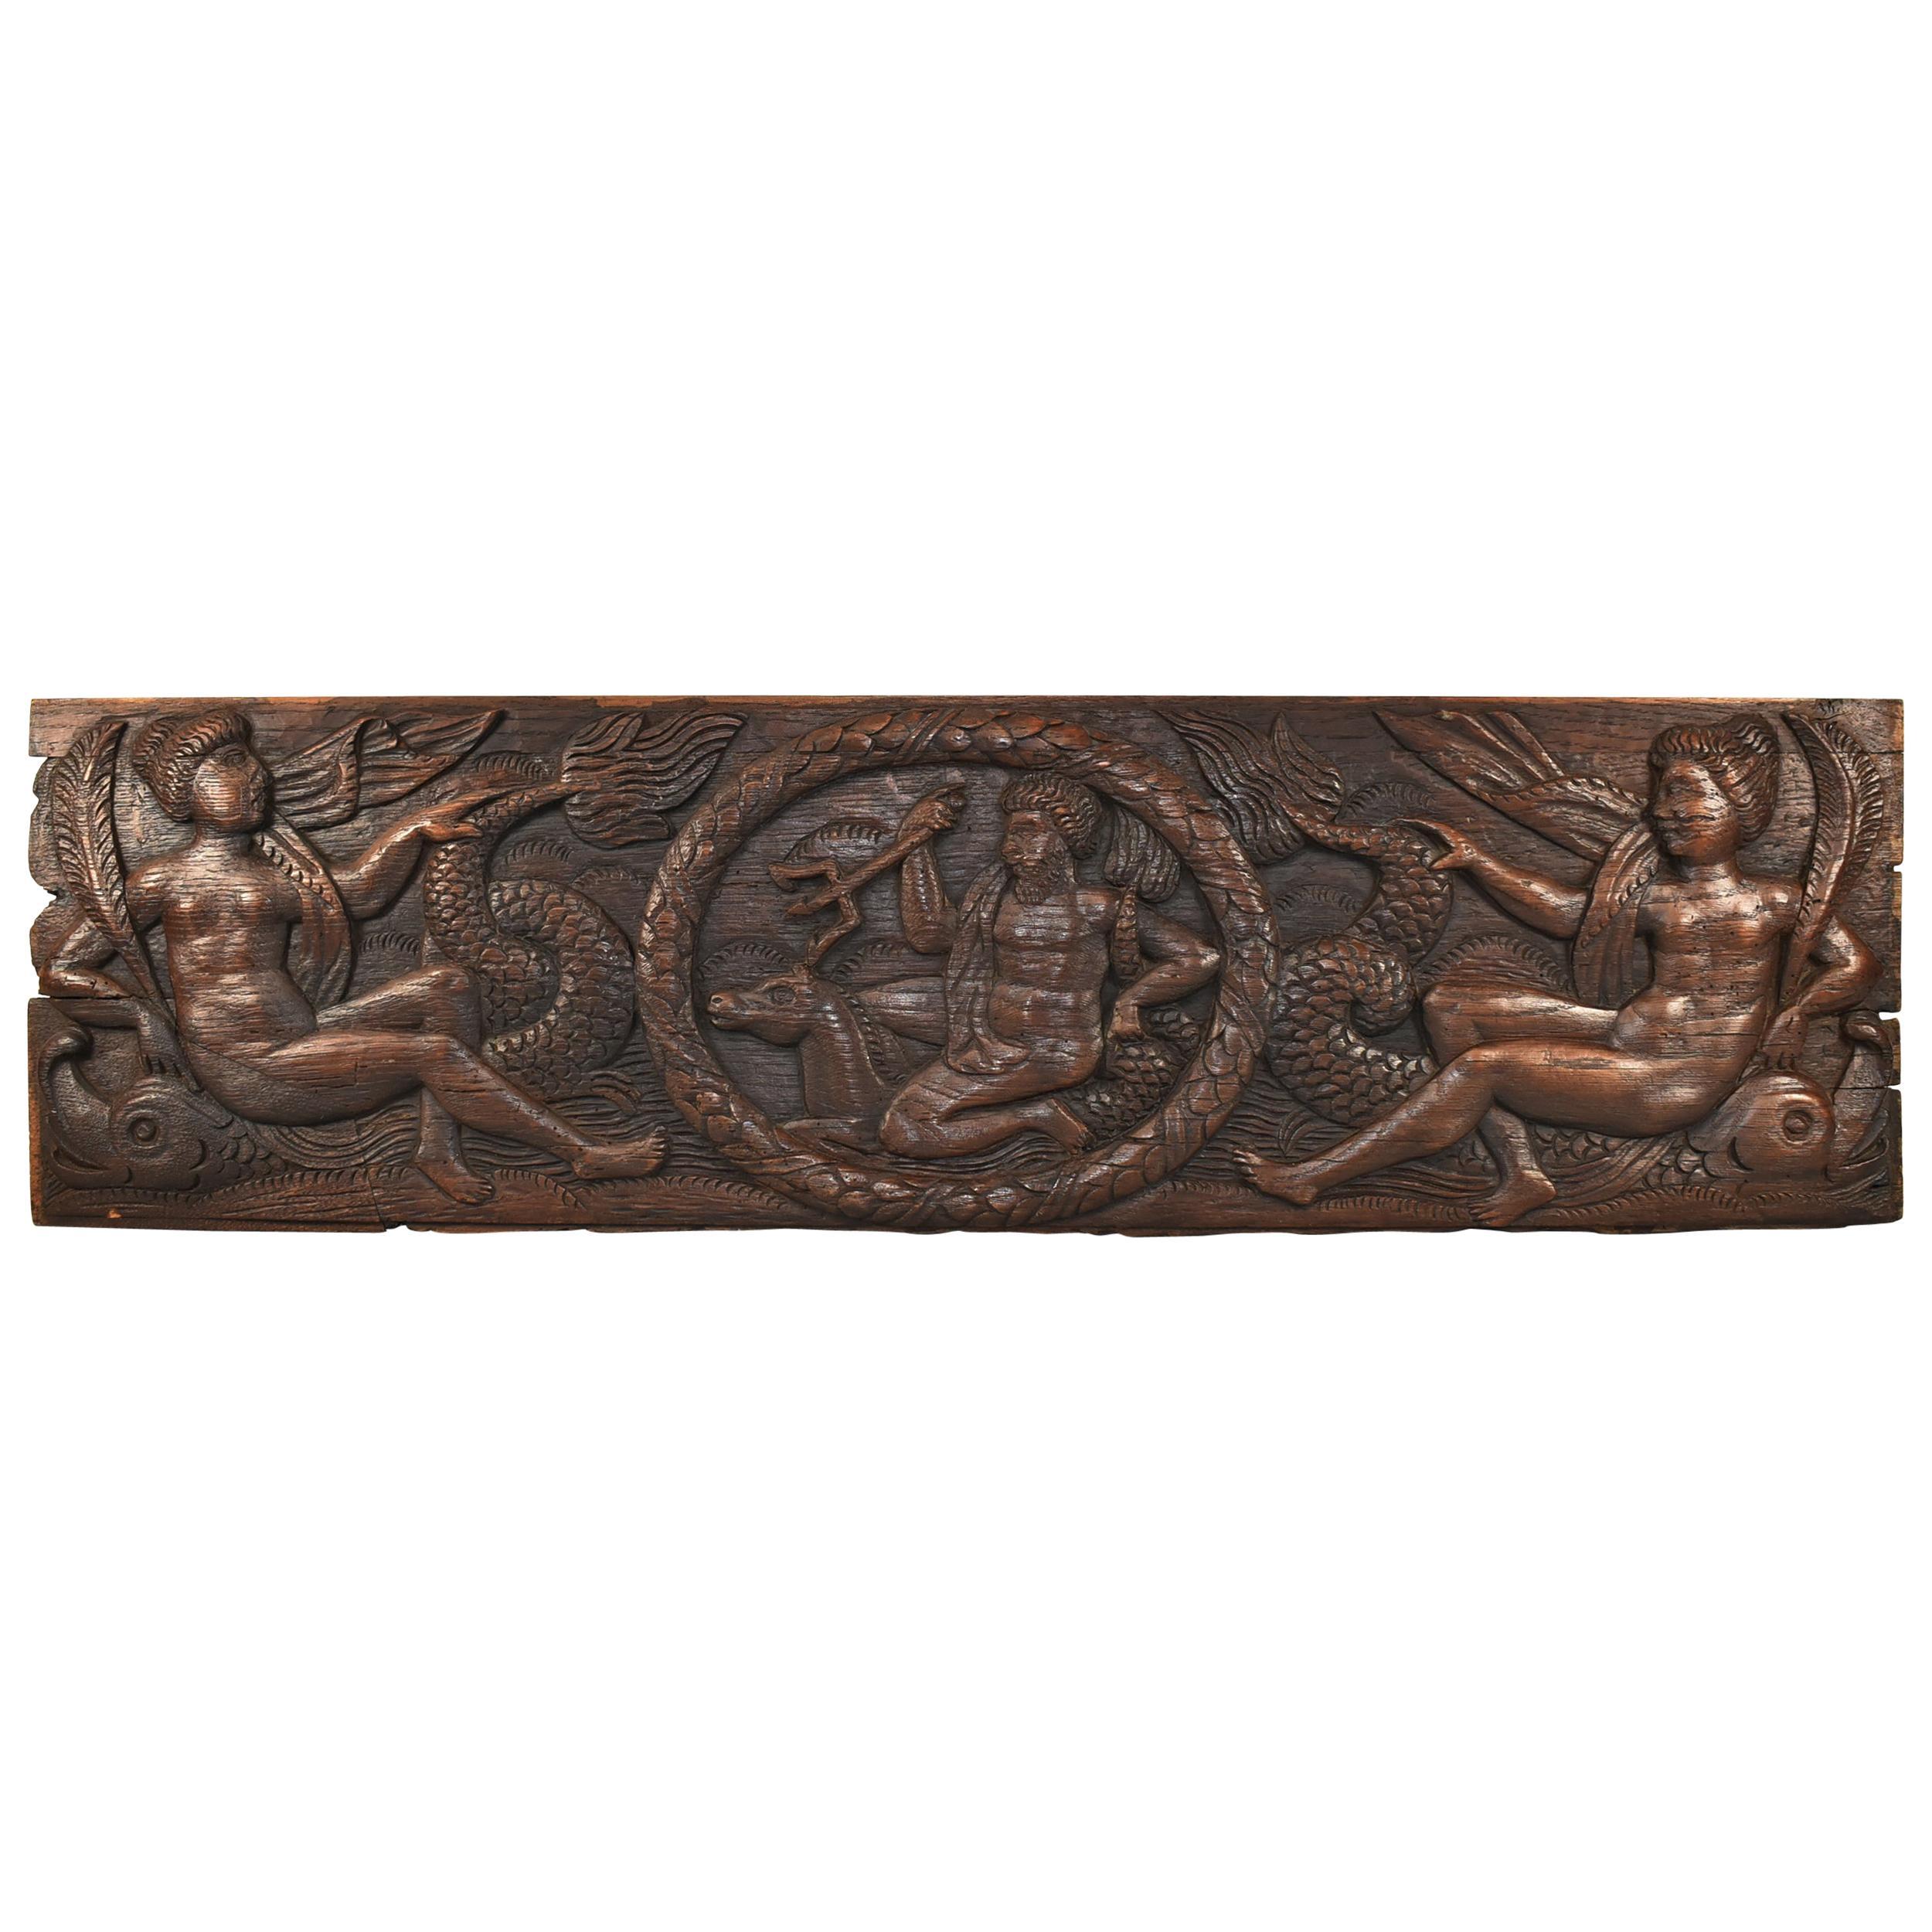 Antique Art Deco Carved Oak Panel Neptune and Sea Serpent